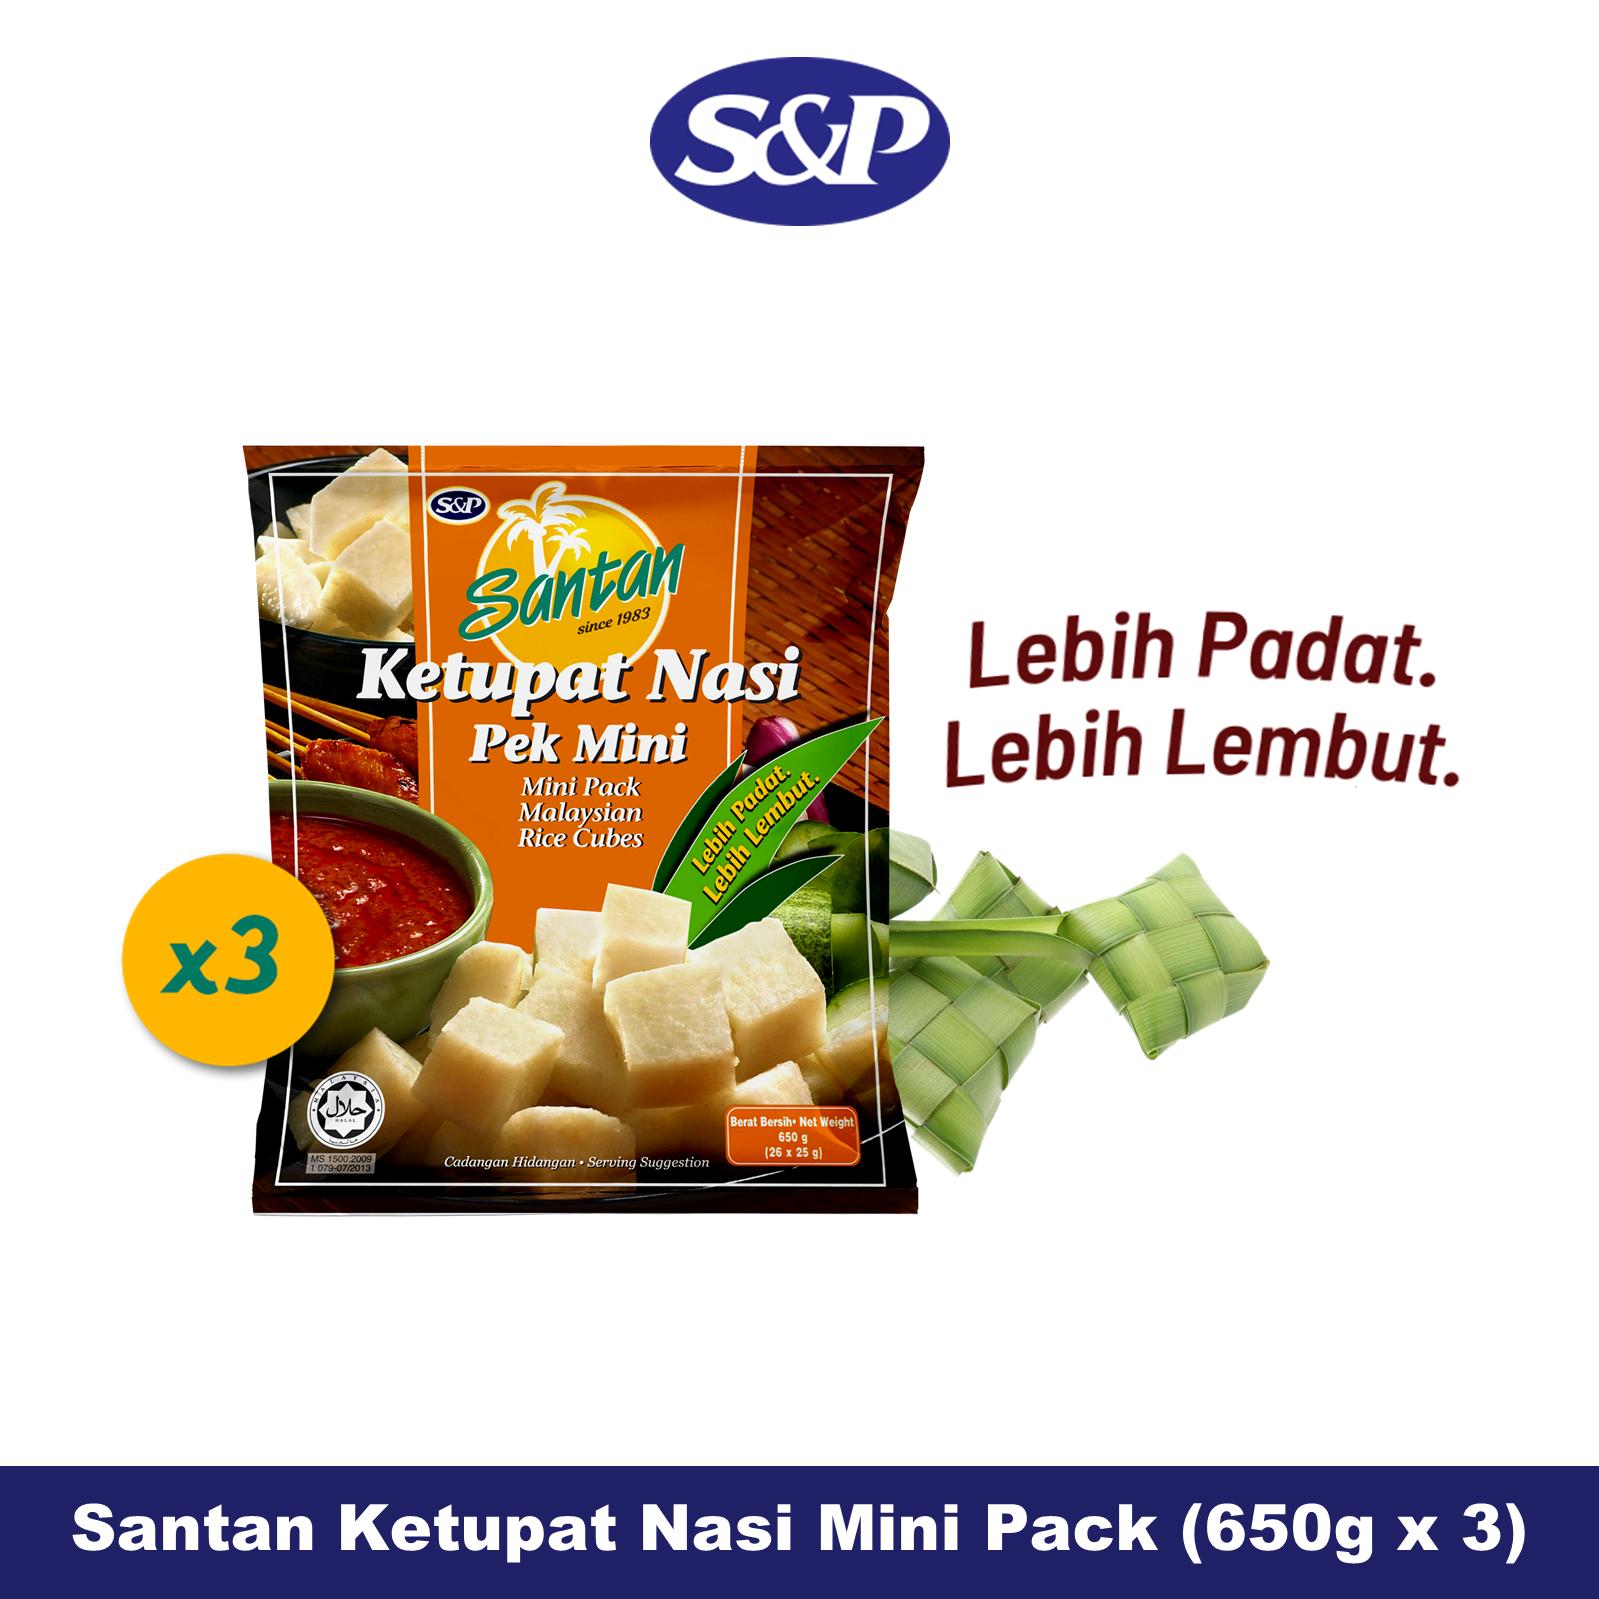 S&P Santan Rice Dumpling MINI PACK Ketupat Nasi (650g x3)